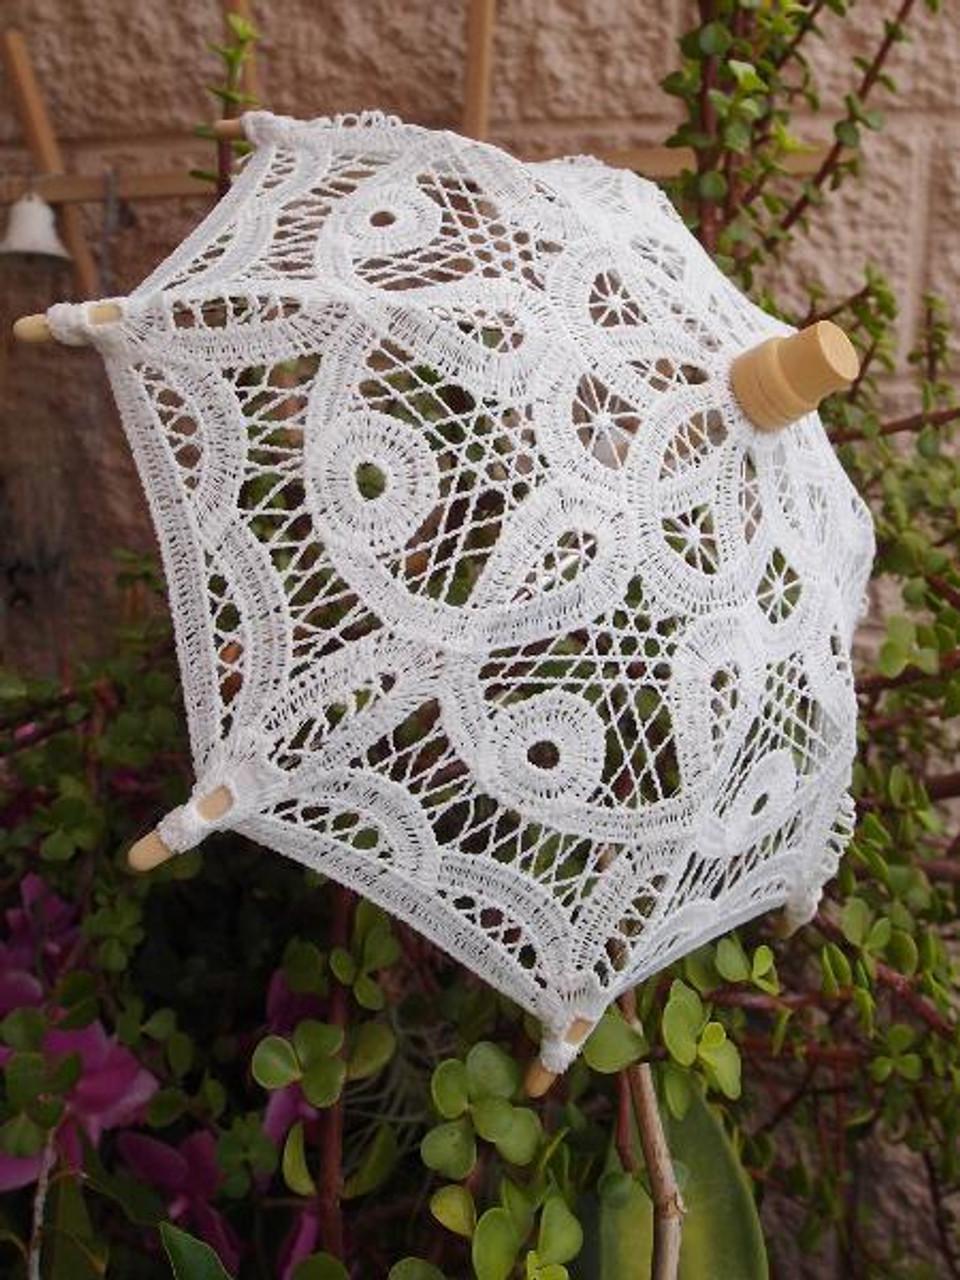 Battenburg Lace Parasol for Weddings and Events, Lace Parasols   Packaging Decor